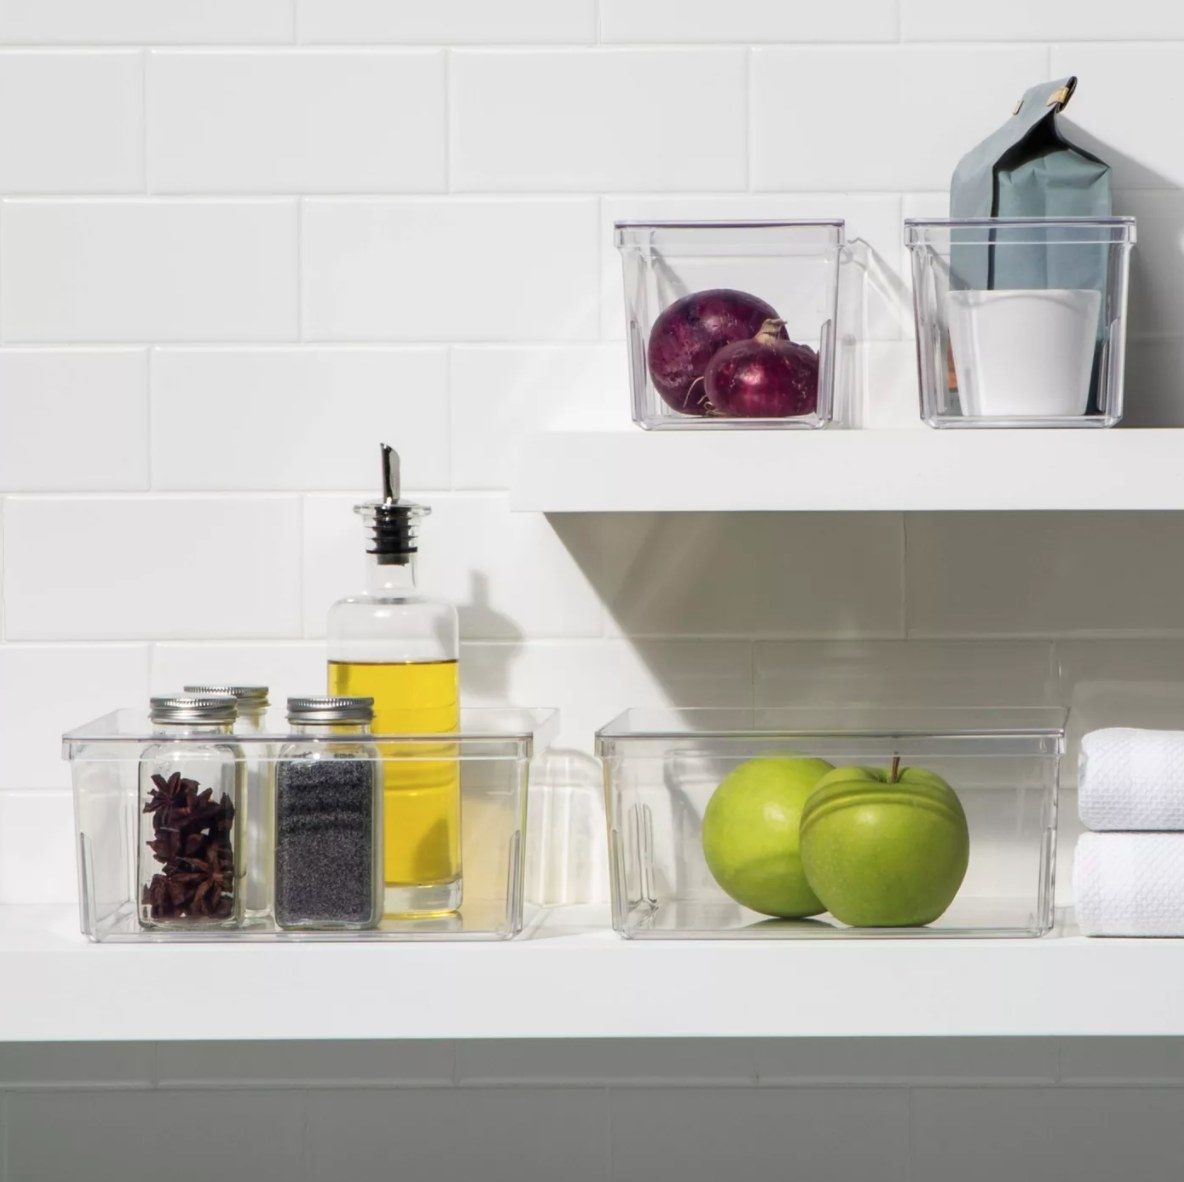 The four-piece refrigerator storage bin set in clear plastic